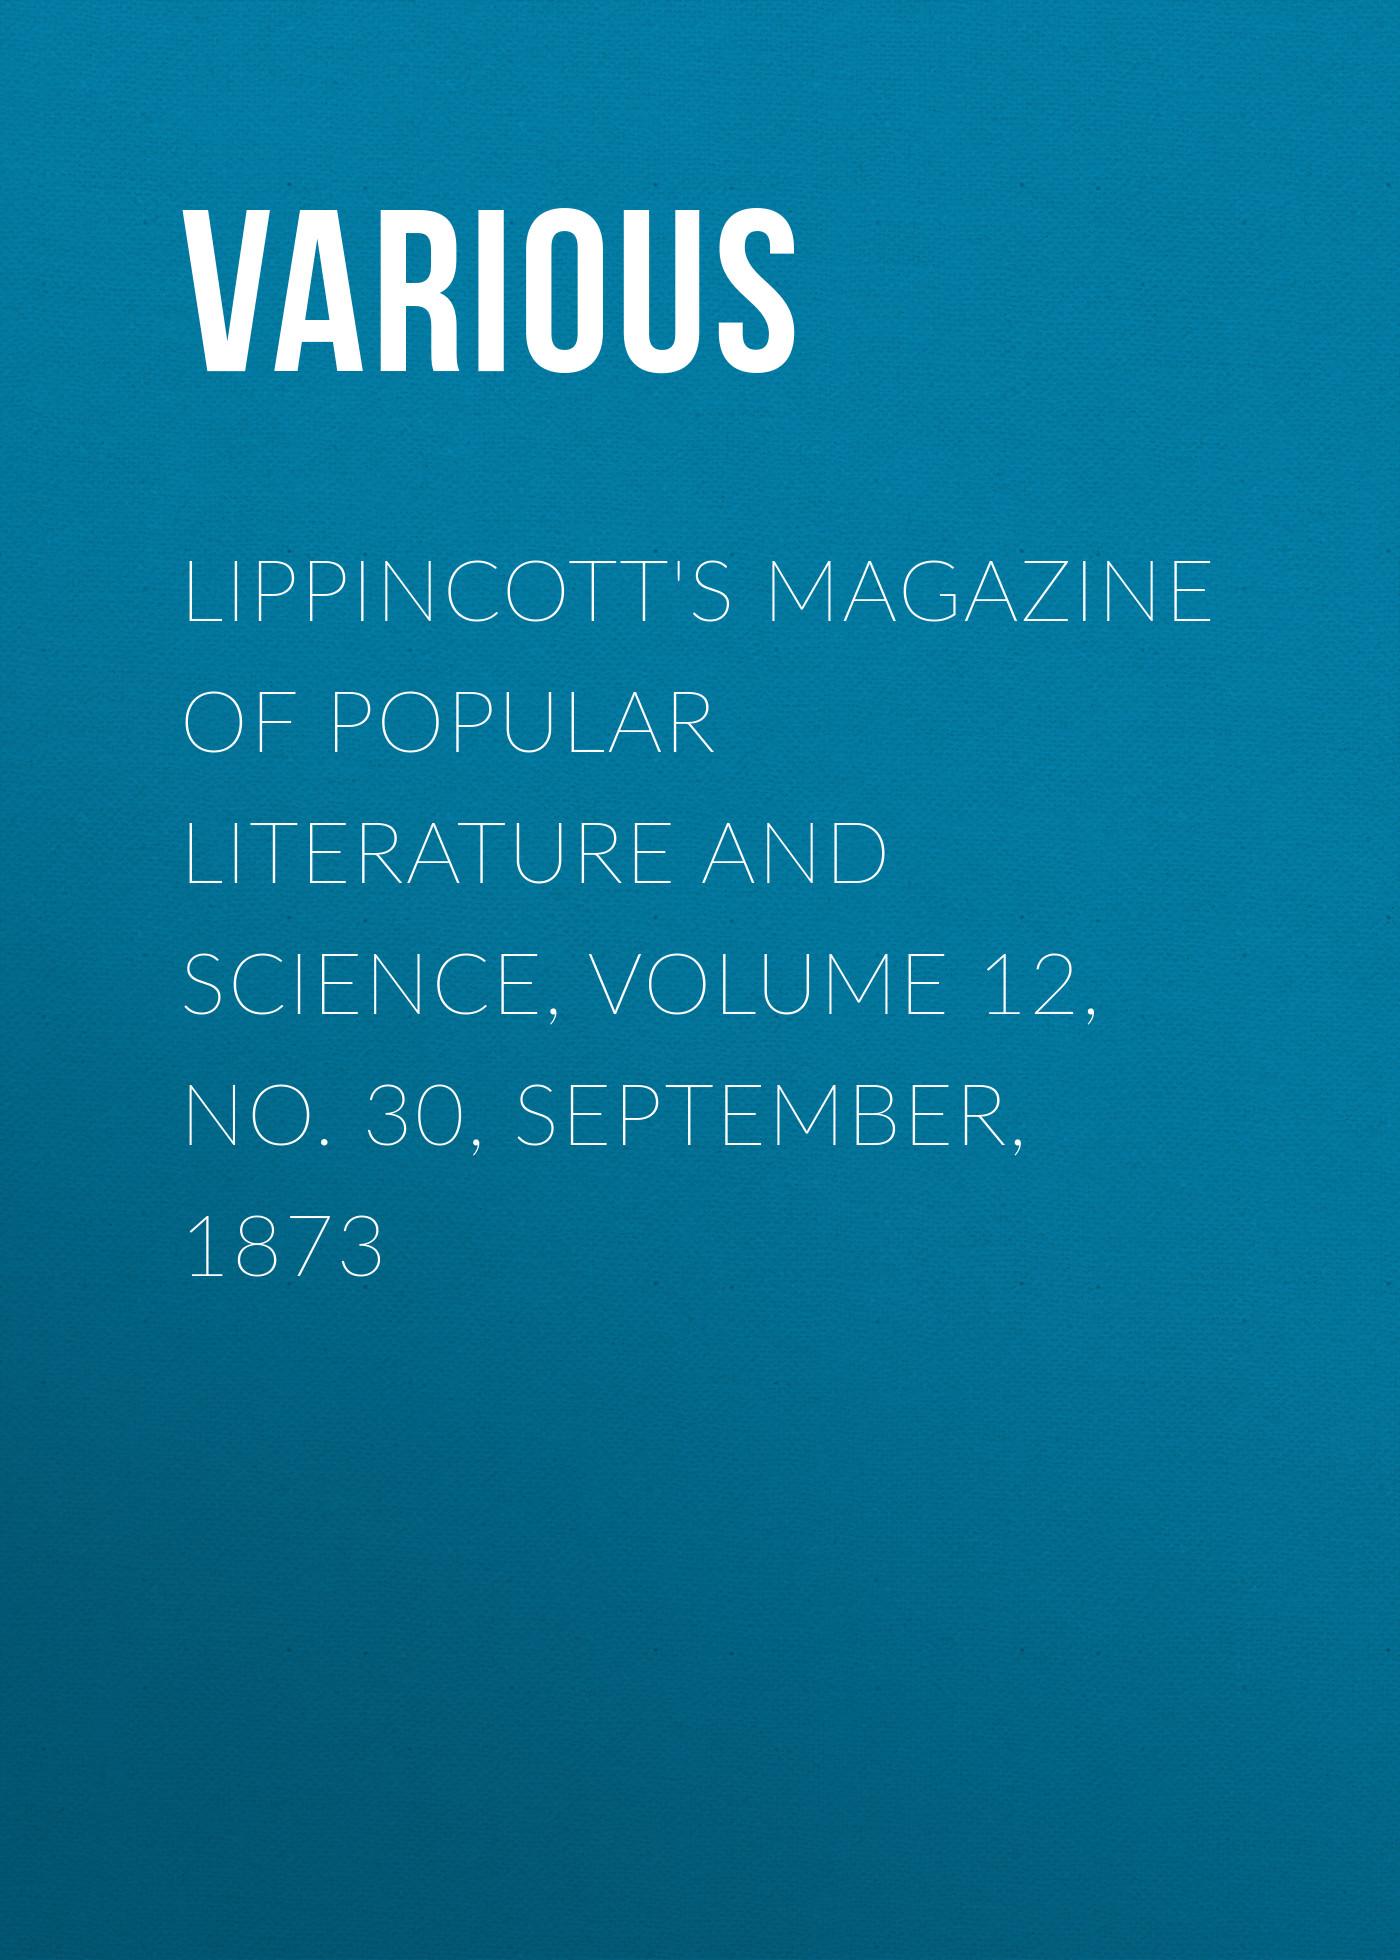 Various Lippincott's Magazine of Popular Literature and Science, Volume 12, No. 30, September, 1873 dai wang 1837 1873 guanzi jiao zheng 24 juan volume 1 mandarin chinese edition